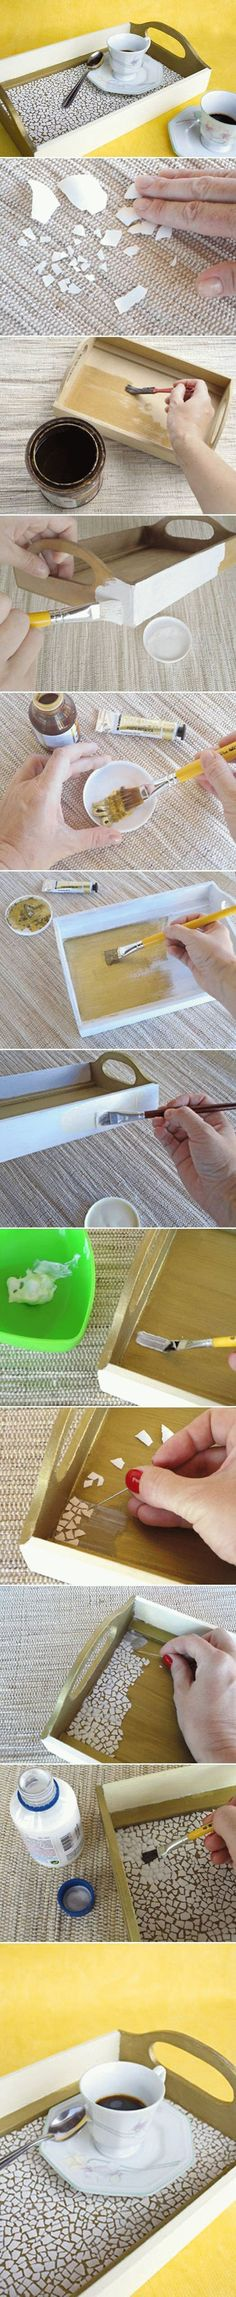 DIY Eggshell Mosaic Tray